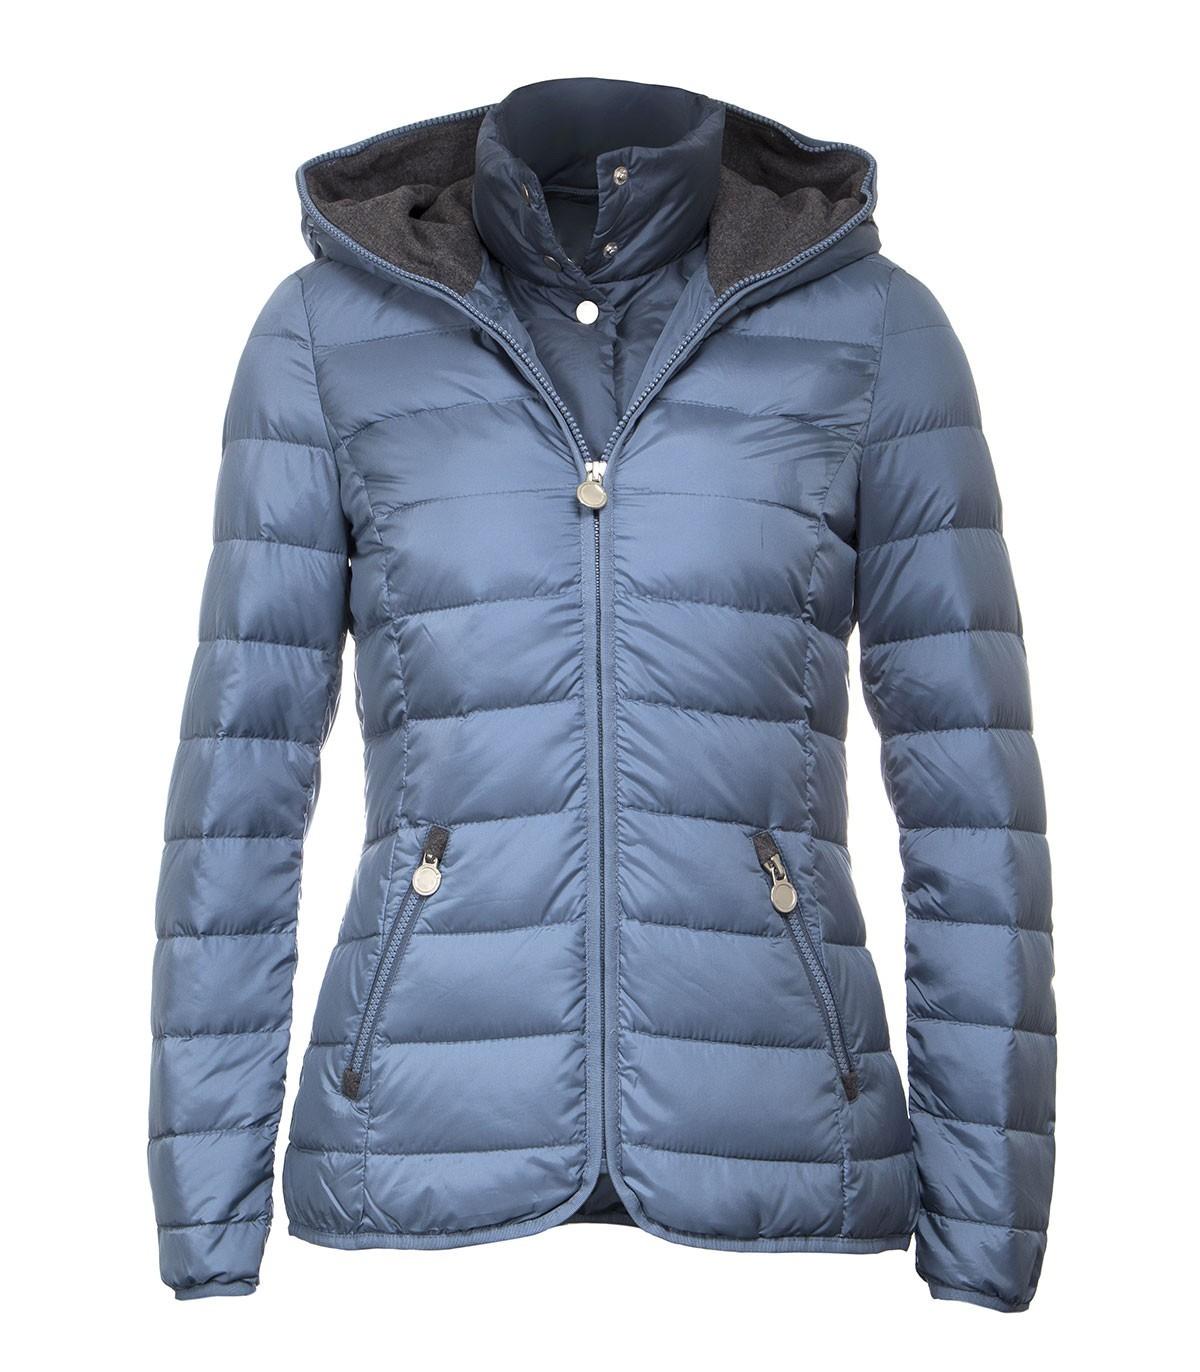 Women s lightweight rain jacket with detachable hood c8e40086dce8